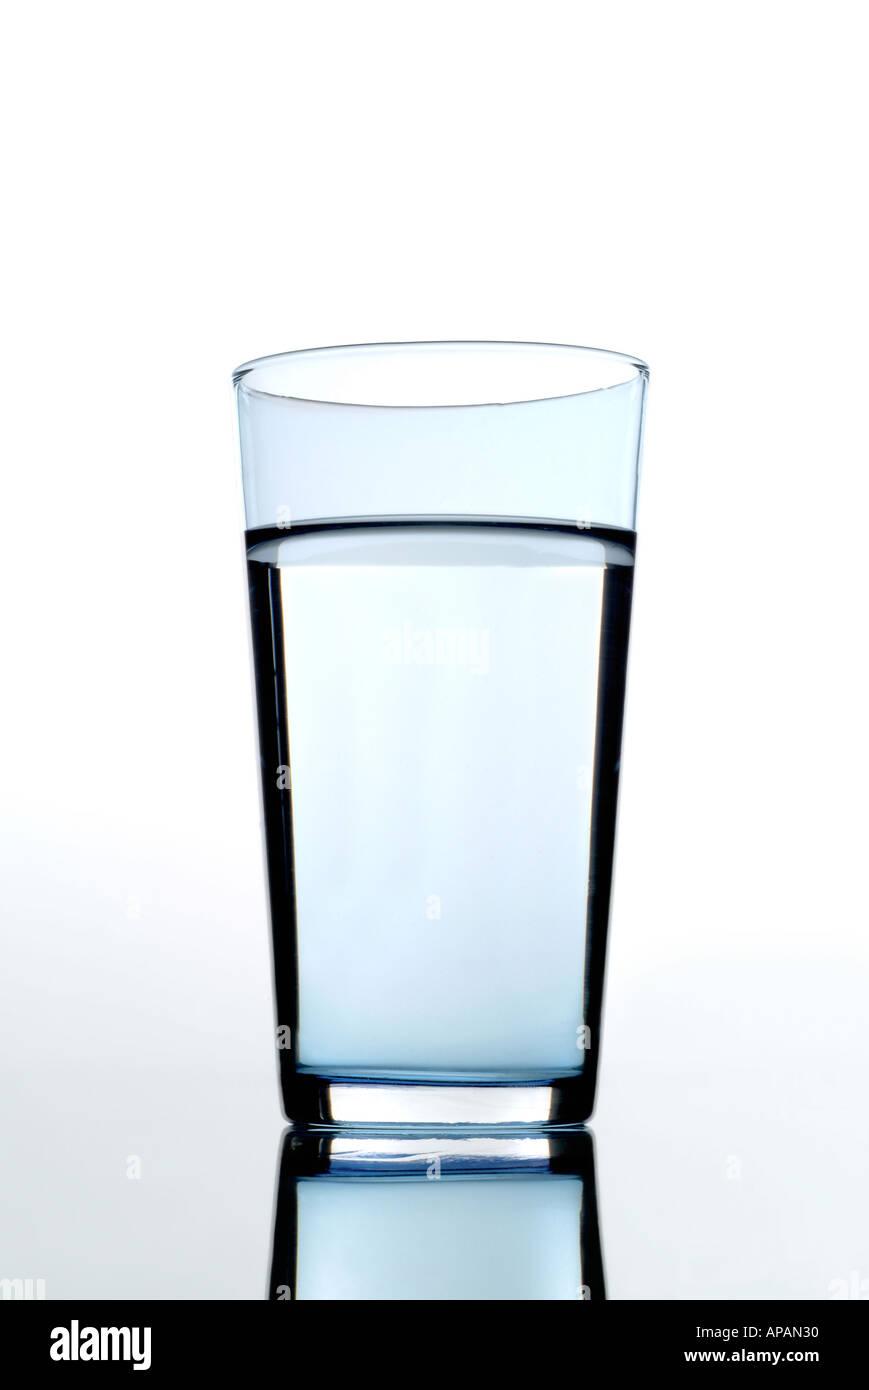 L'eau minérale Mineralwasser Photo Stock